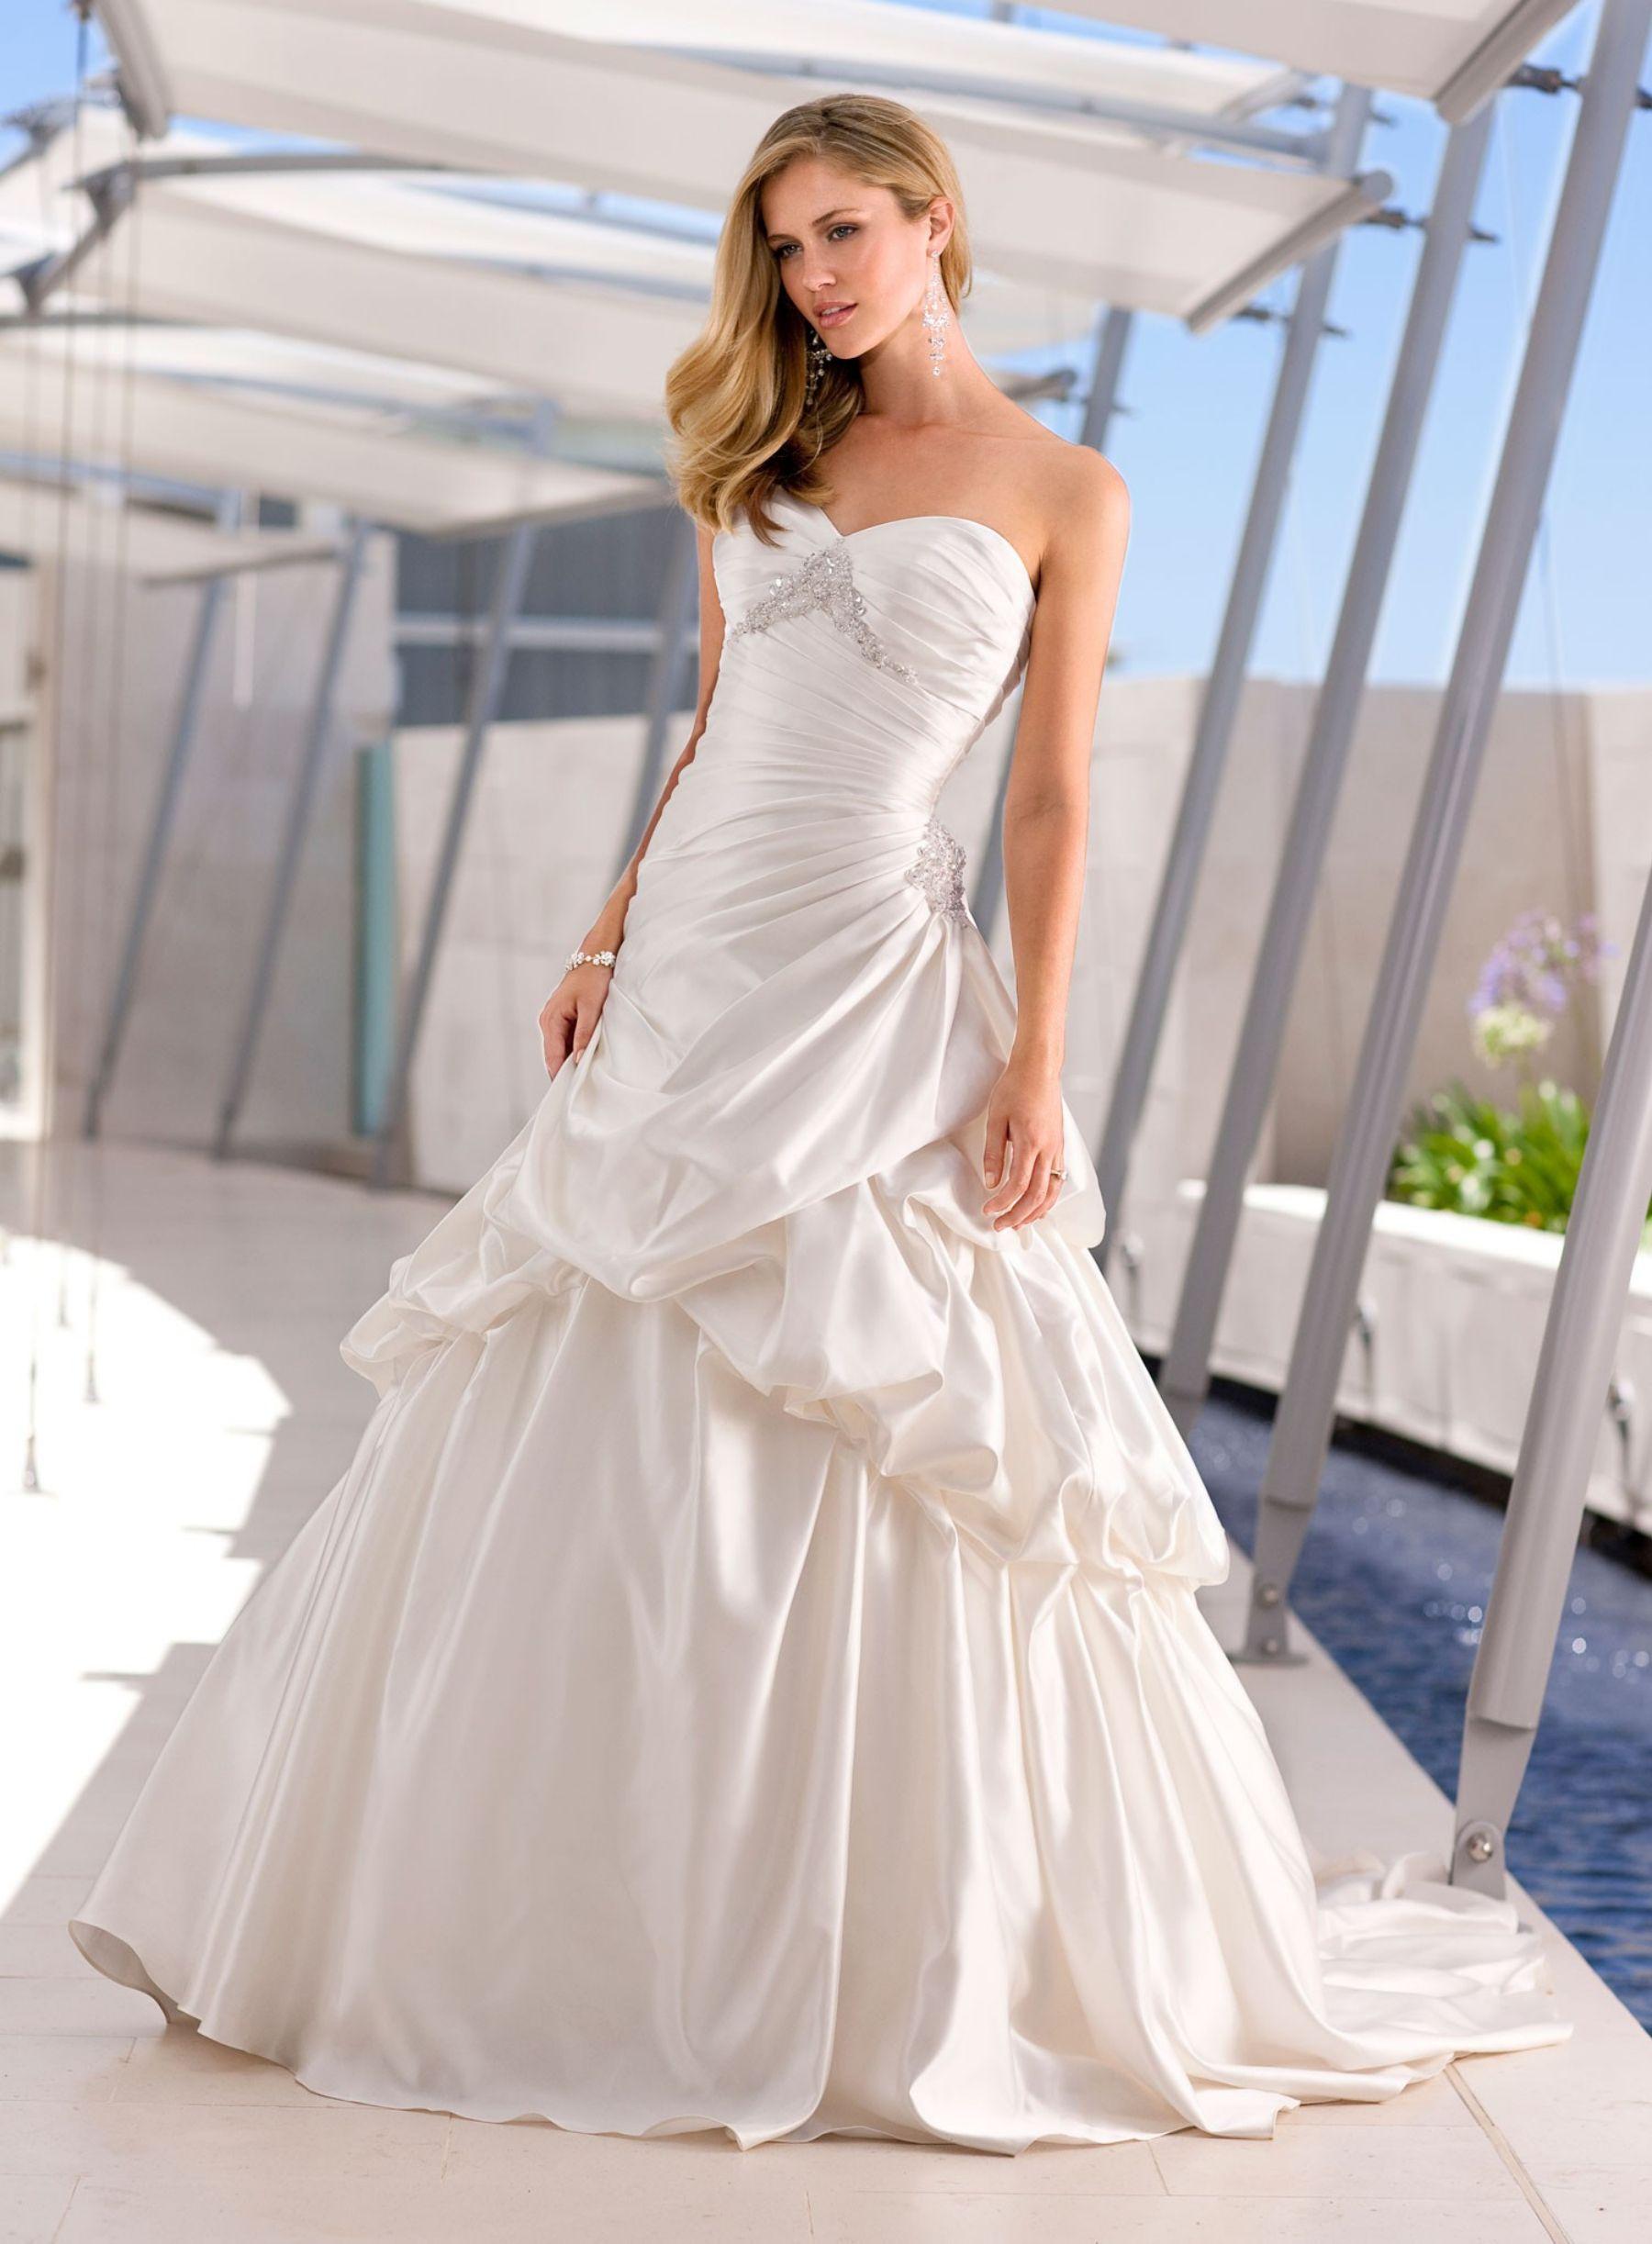 Cheap Wedding Dresses Under 100 Dollars | Weddings | Pinterest ...